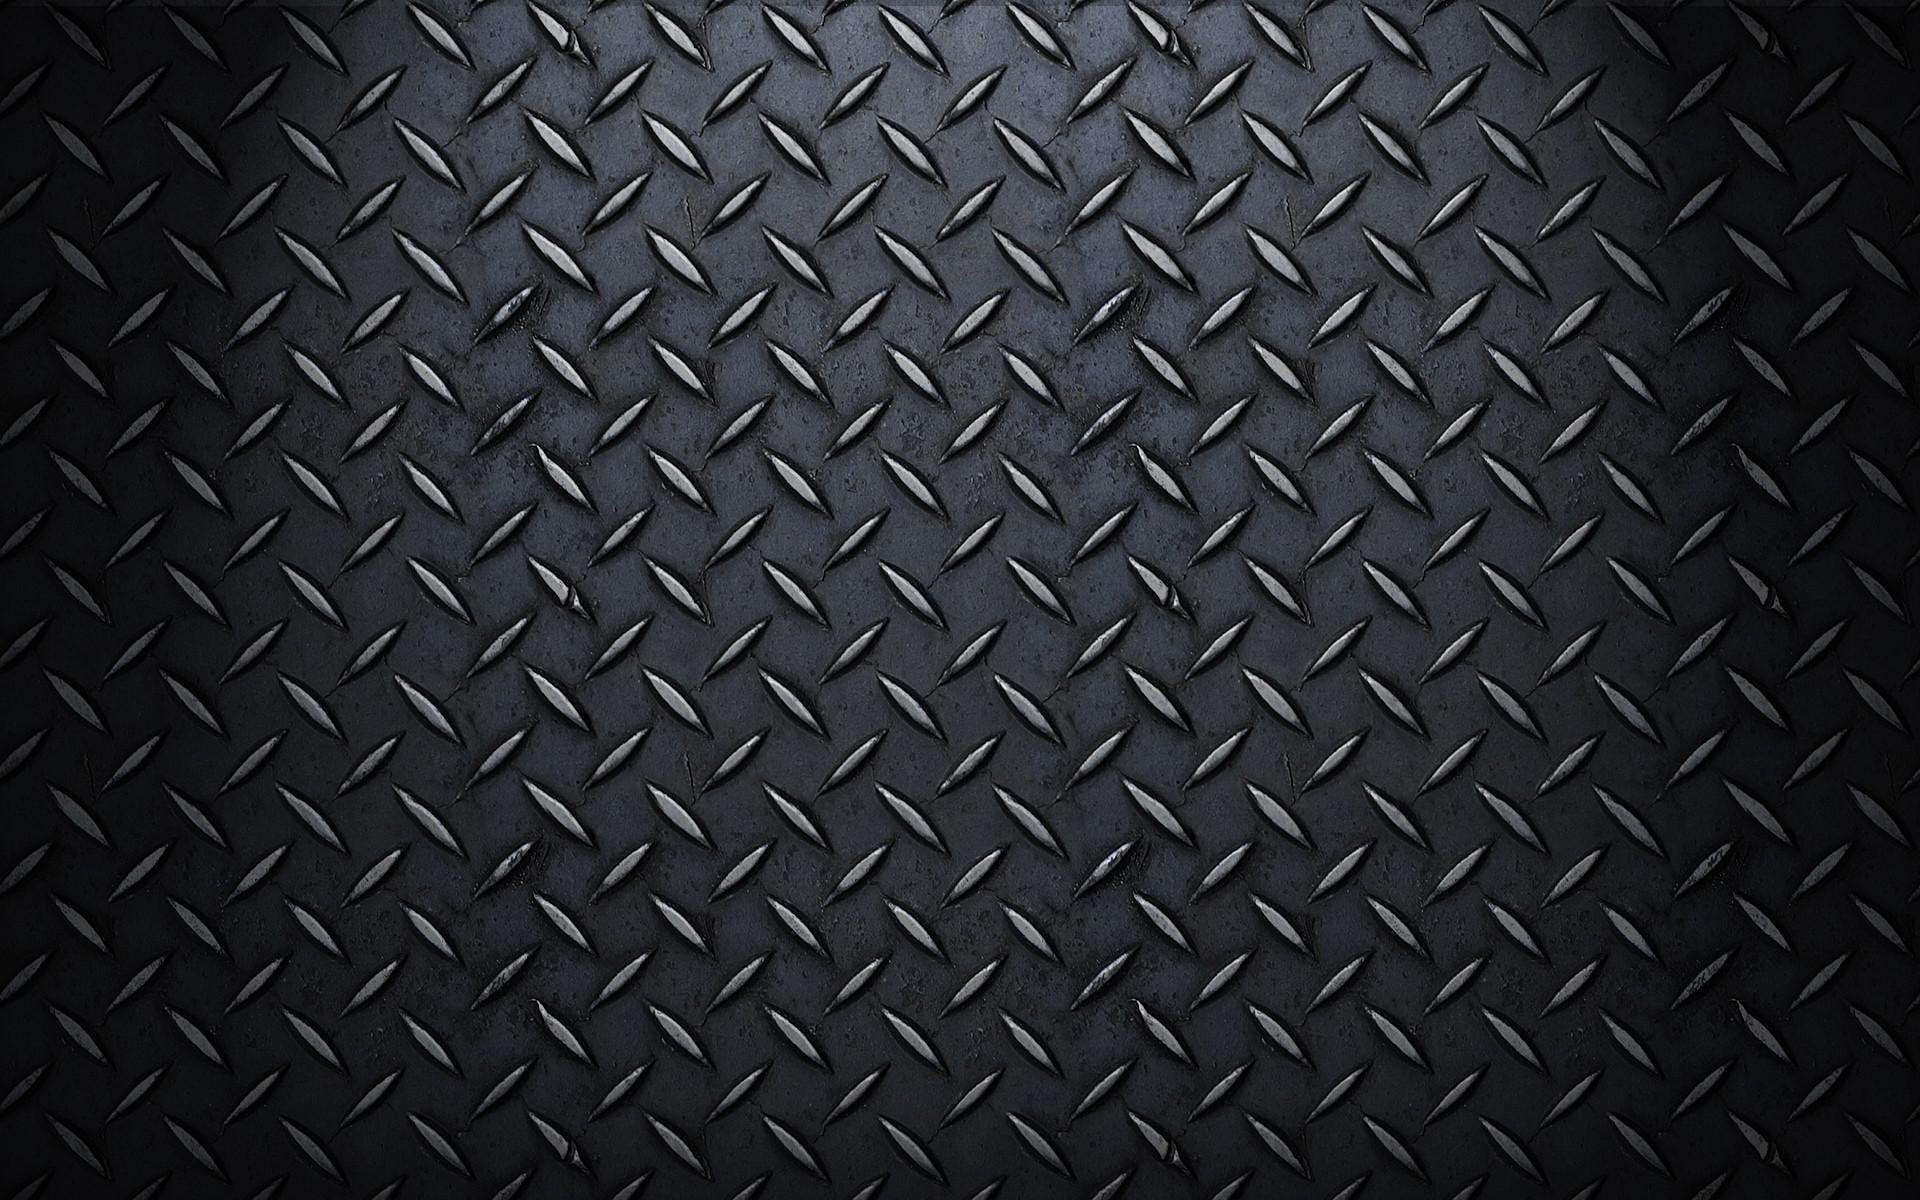 Steel Pattern Black Metal Diamond Plate Abstract 1920x1200 Metal Pattern 1080p Wallpape Carbon Fiber Wallpaper Carbon Fibre Wallpaper Textured Wallpaper